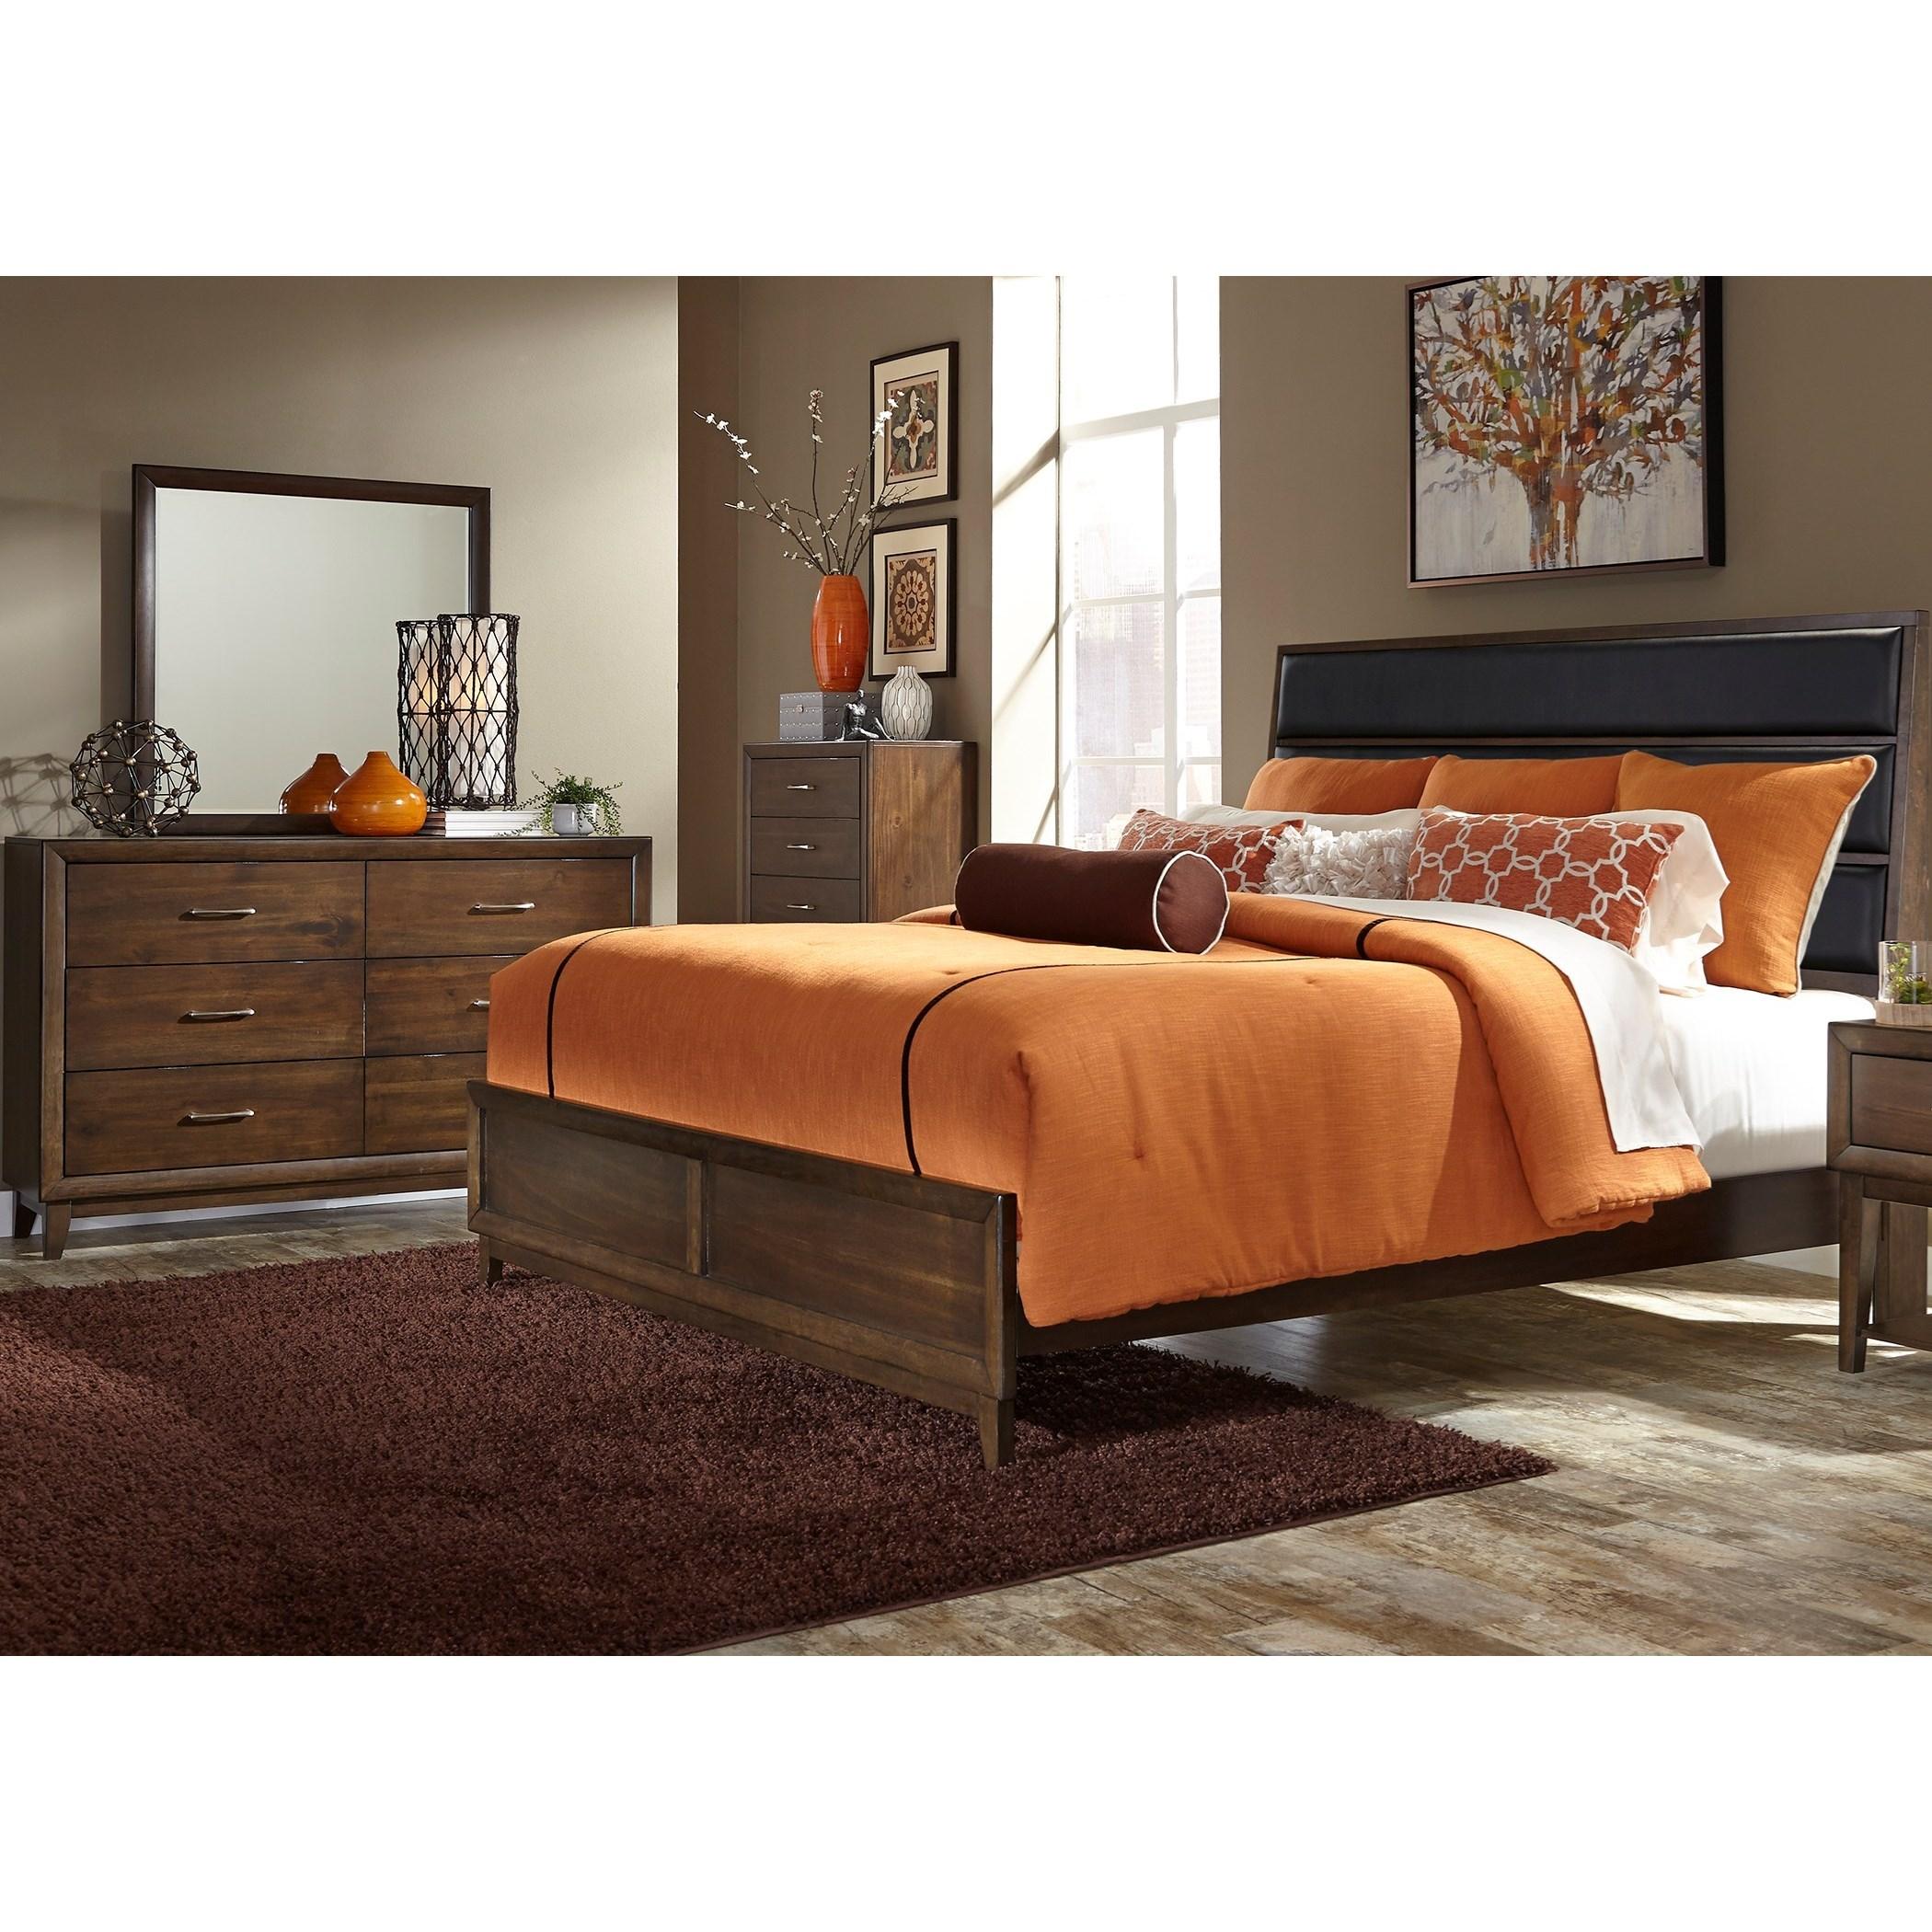 Liberty Furniture Hudson Square Bedroom Queen Bedroom Group - Item Number: 365-BR-QUBDMC